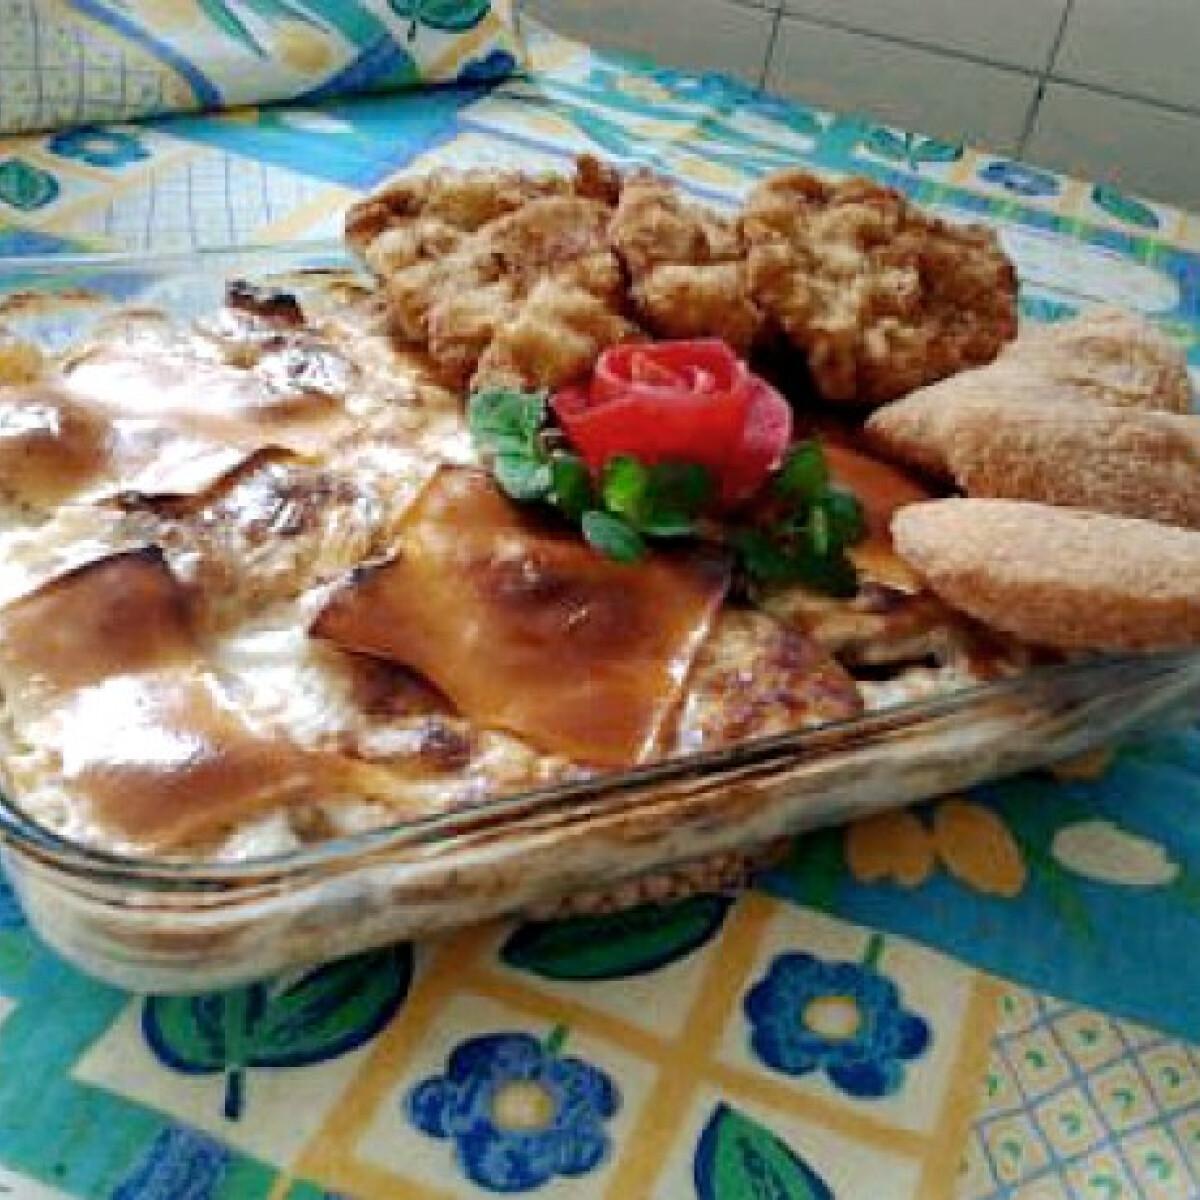 Burgonyatál camembert-rel